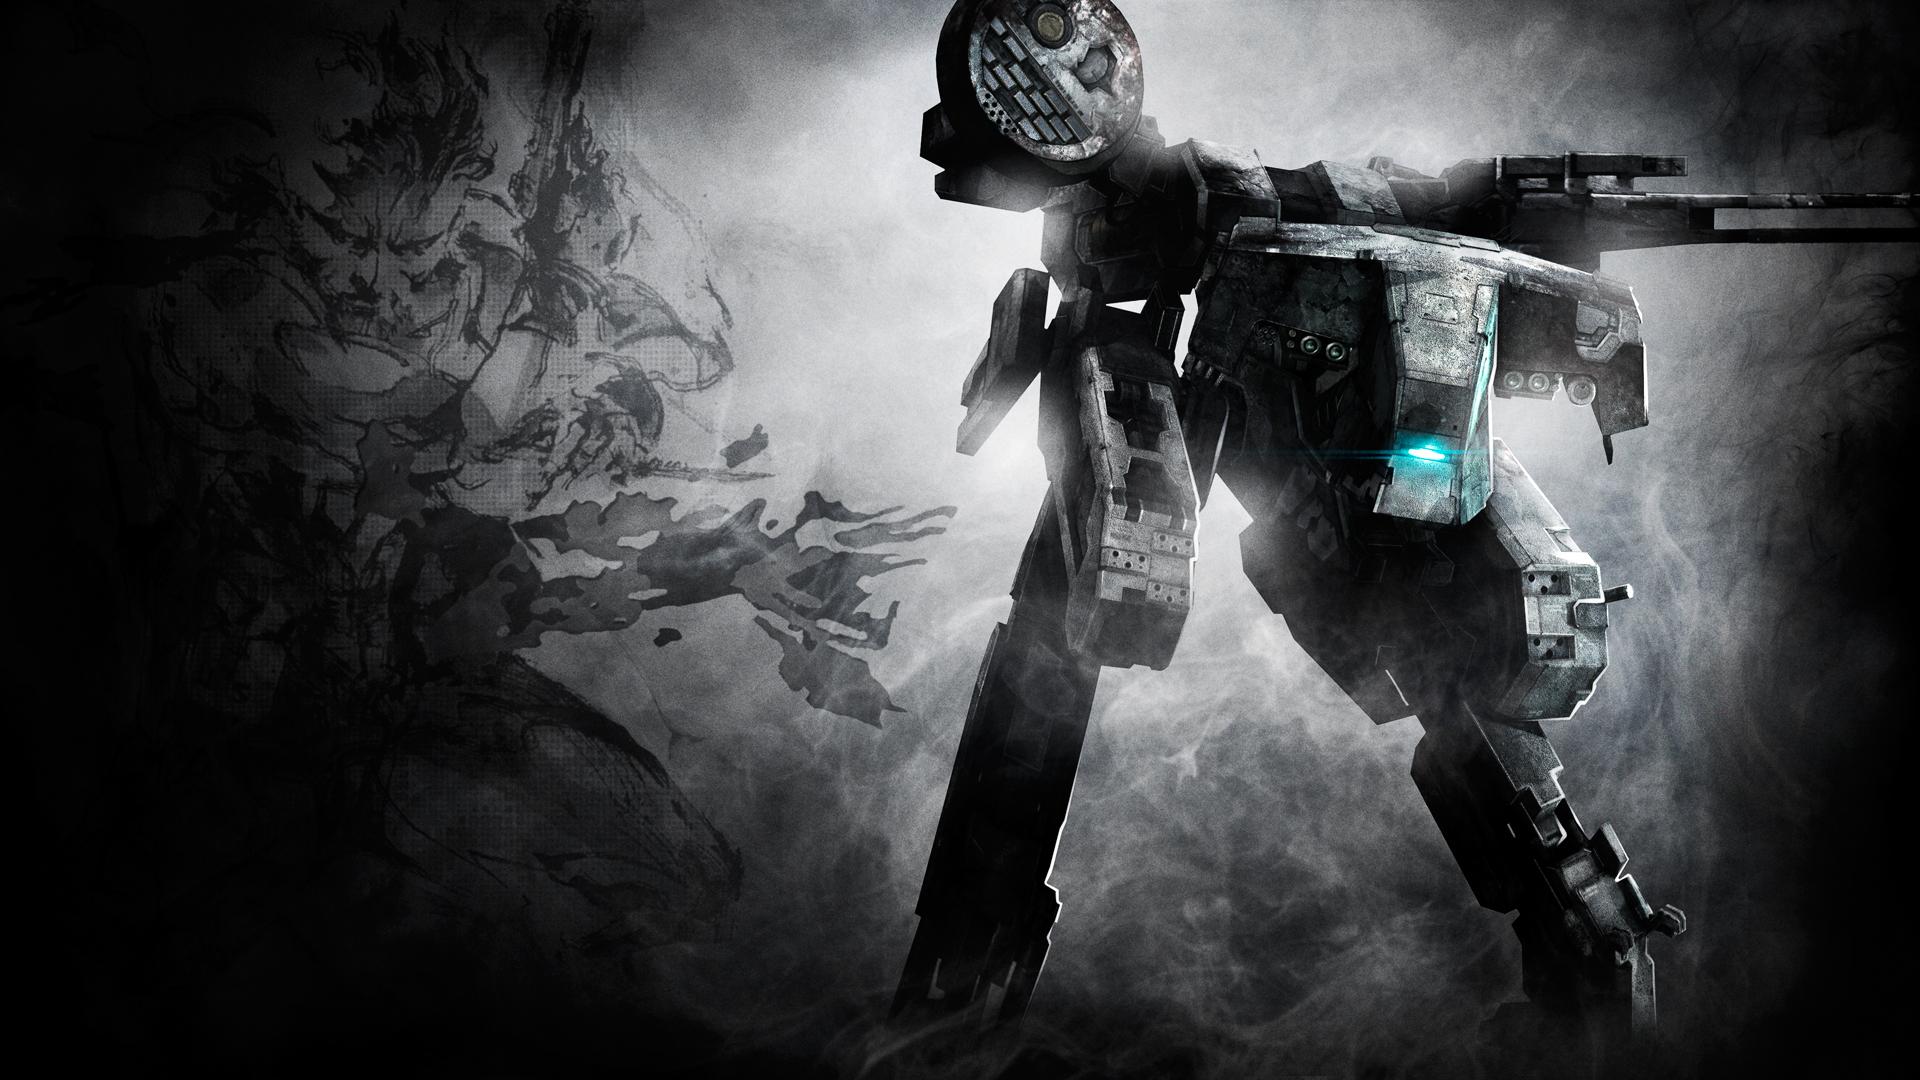 Metal Gear Solid 2 Wallpaper: Metal Gear Solid Mech Mecha Wallpaper